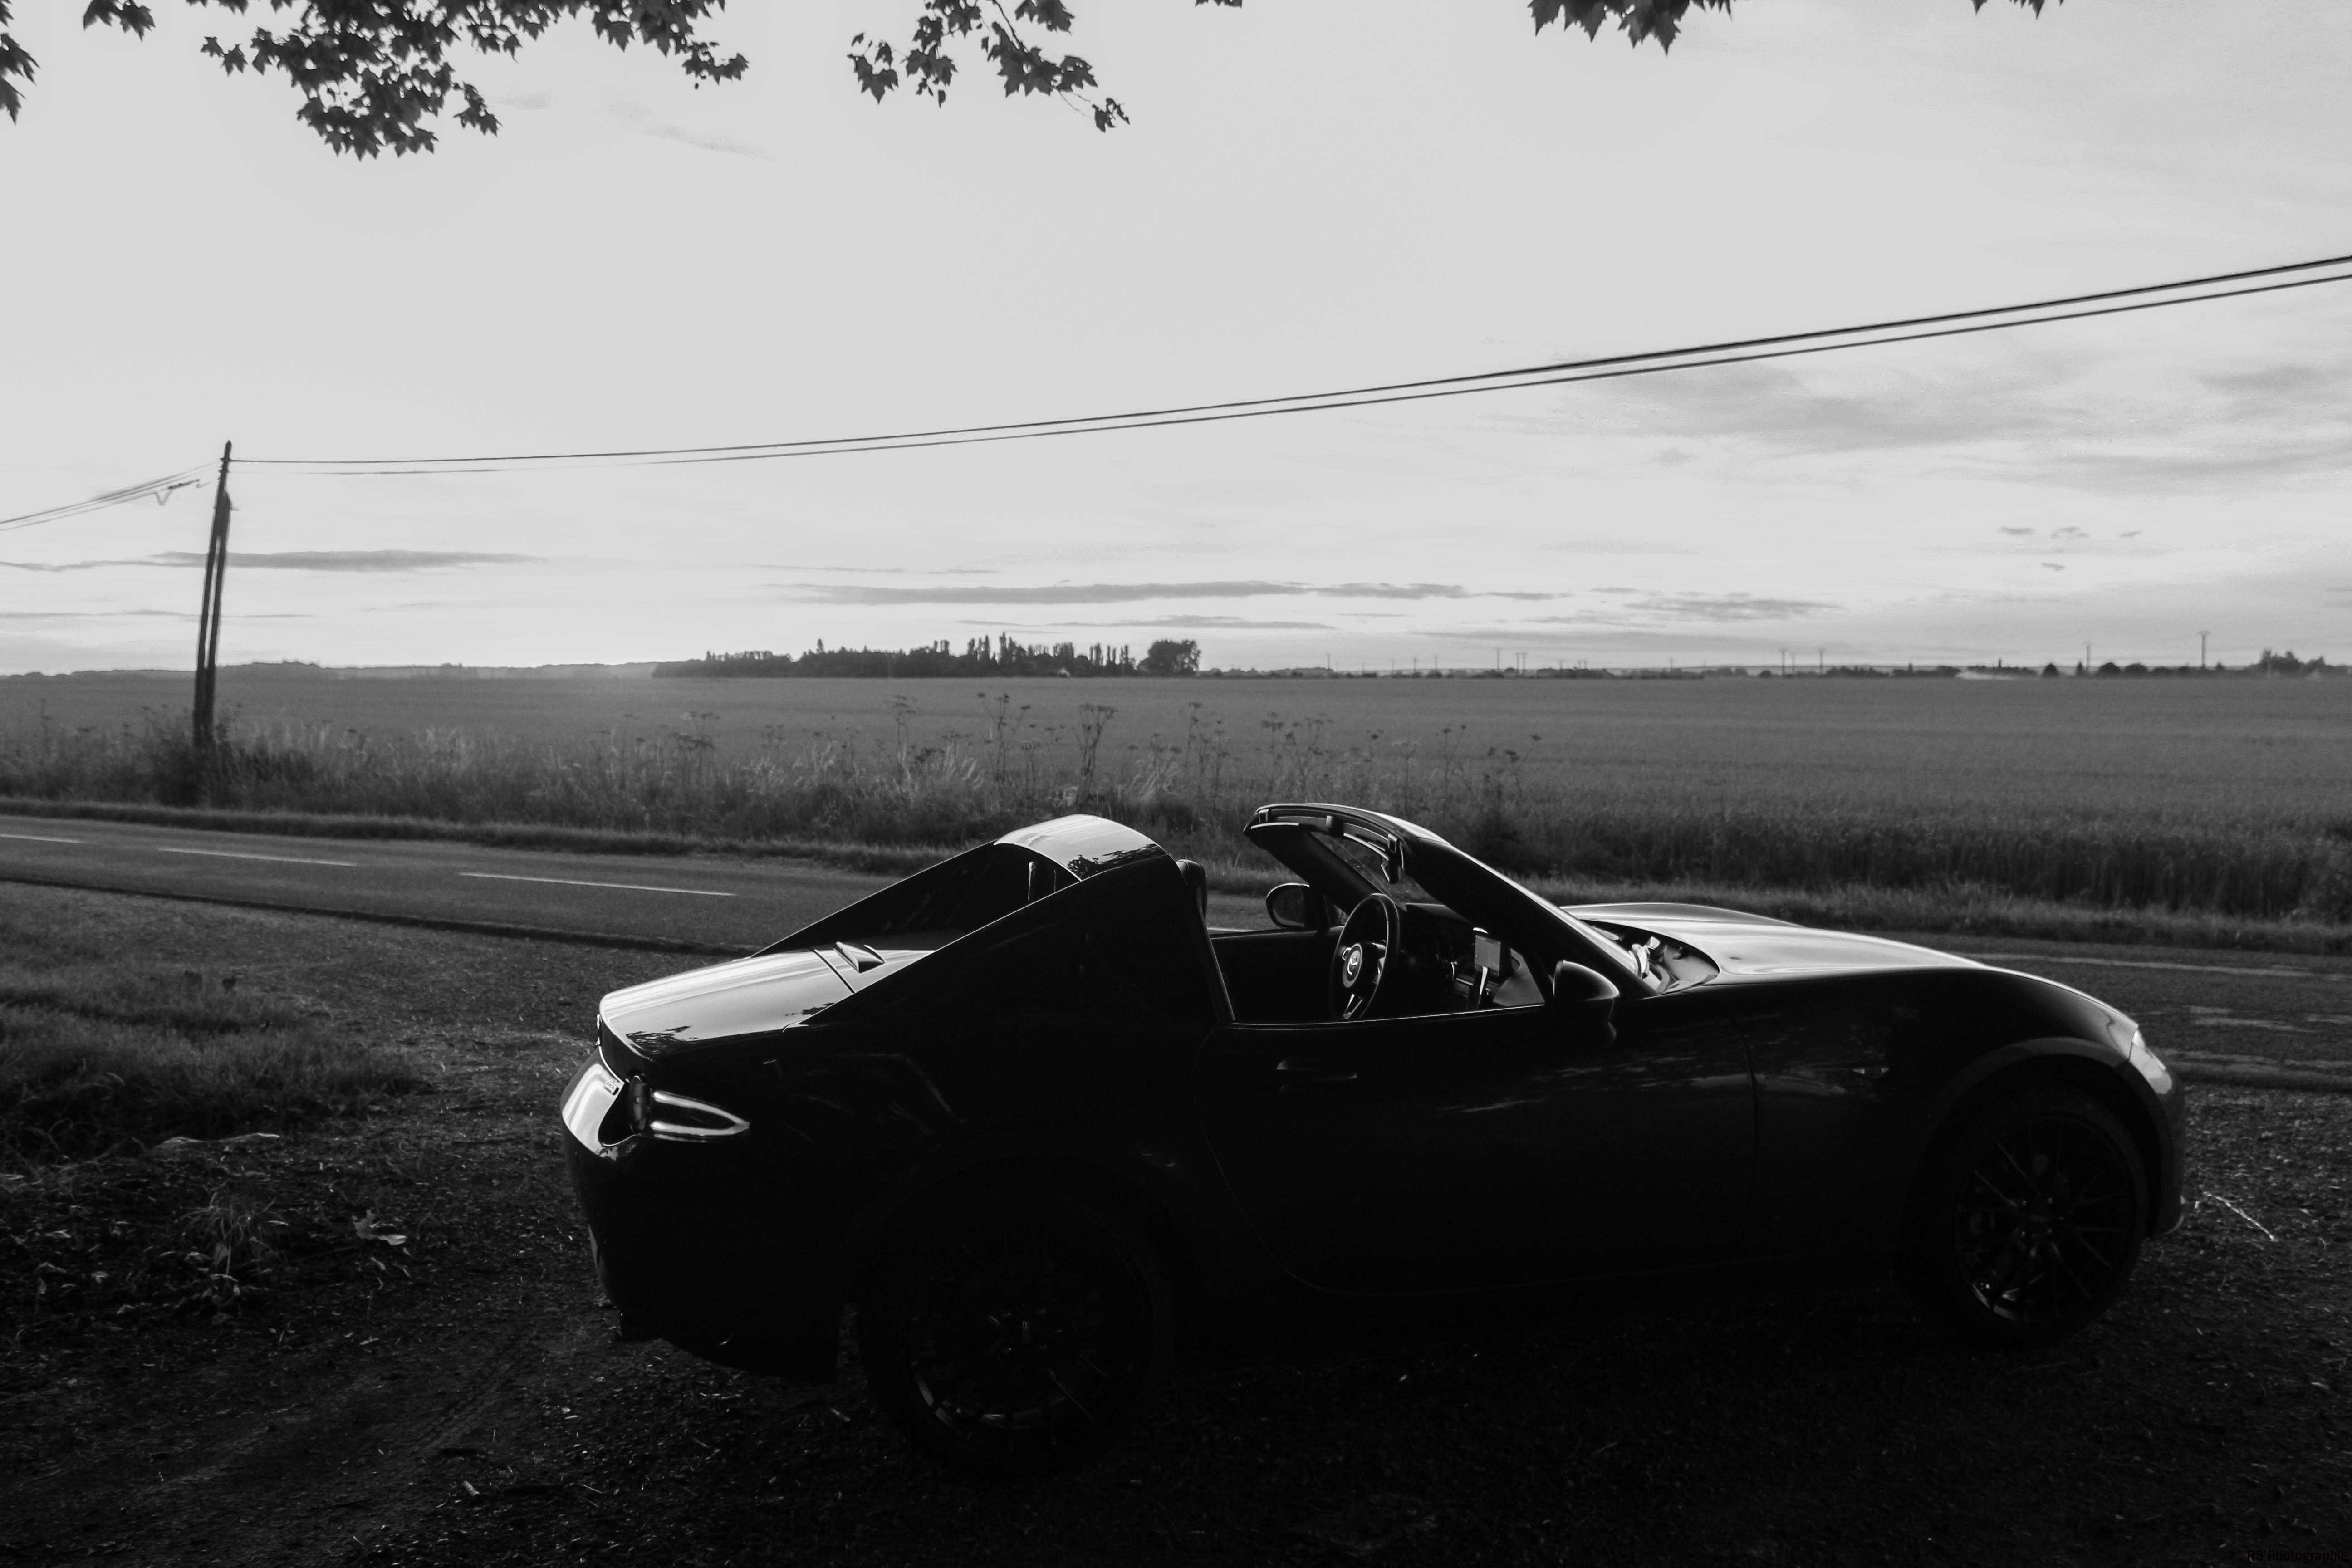 MazdaMX5RF12-mazda-mx5-rf-edition-profil-side-Arnaud Demasier-RSPhotographie